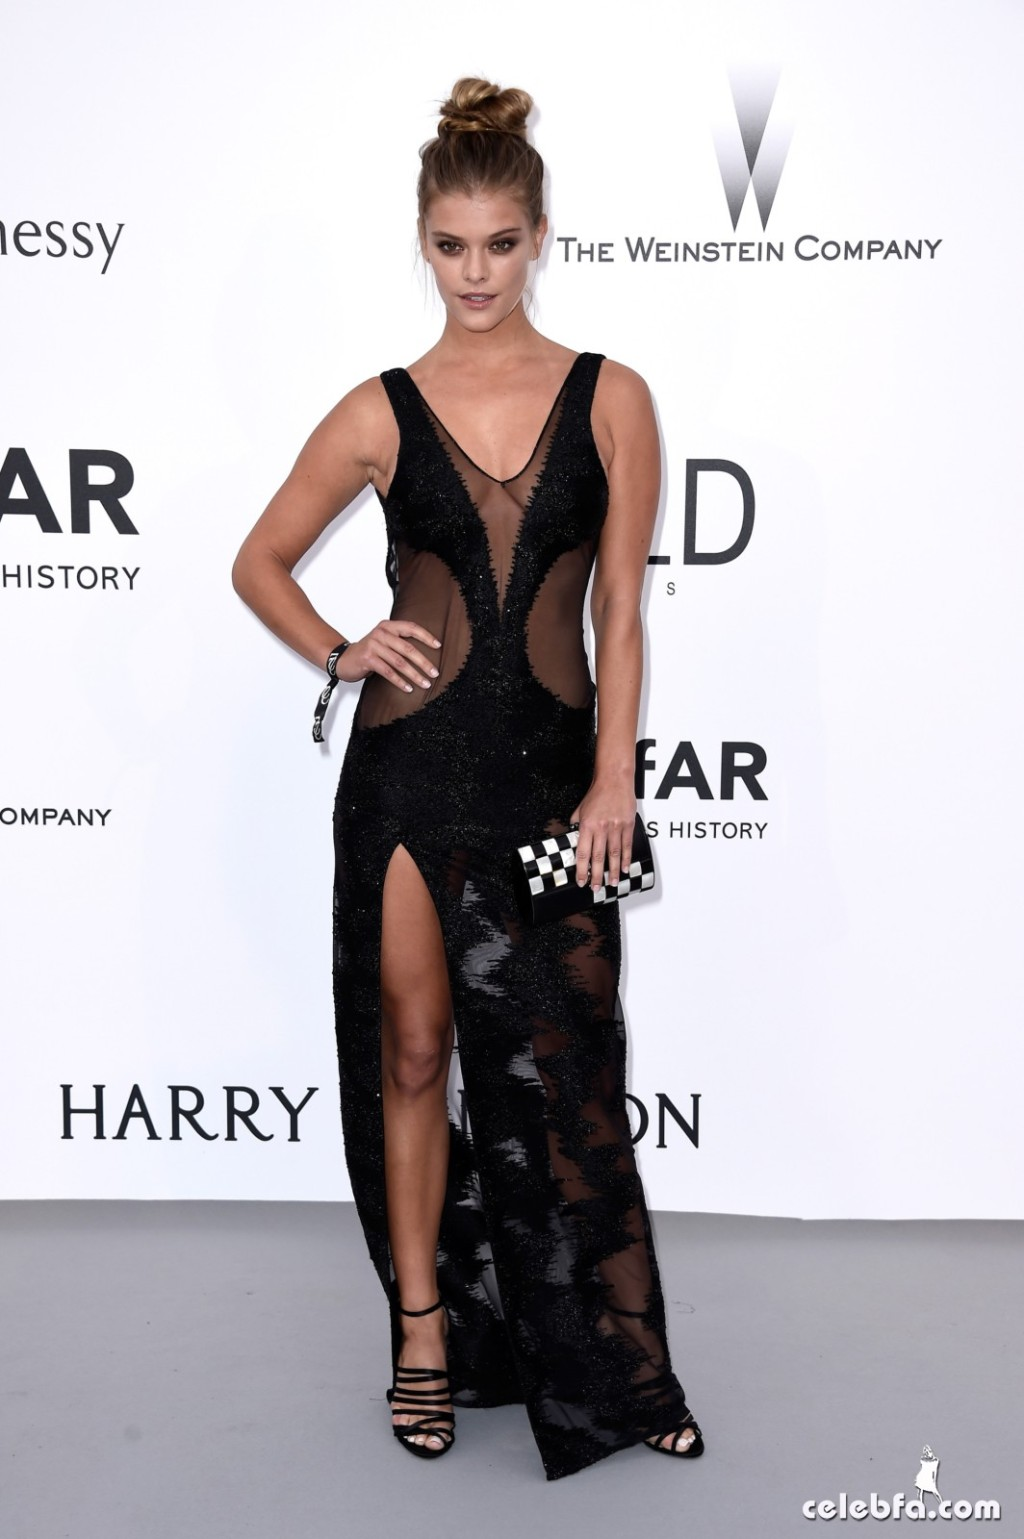 Nina_Agdal_amfAR's Cannes Gala (1)